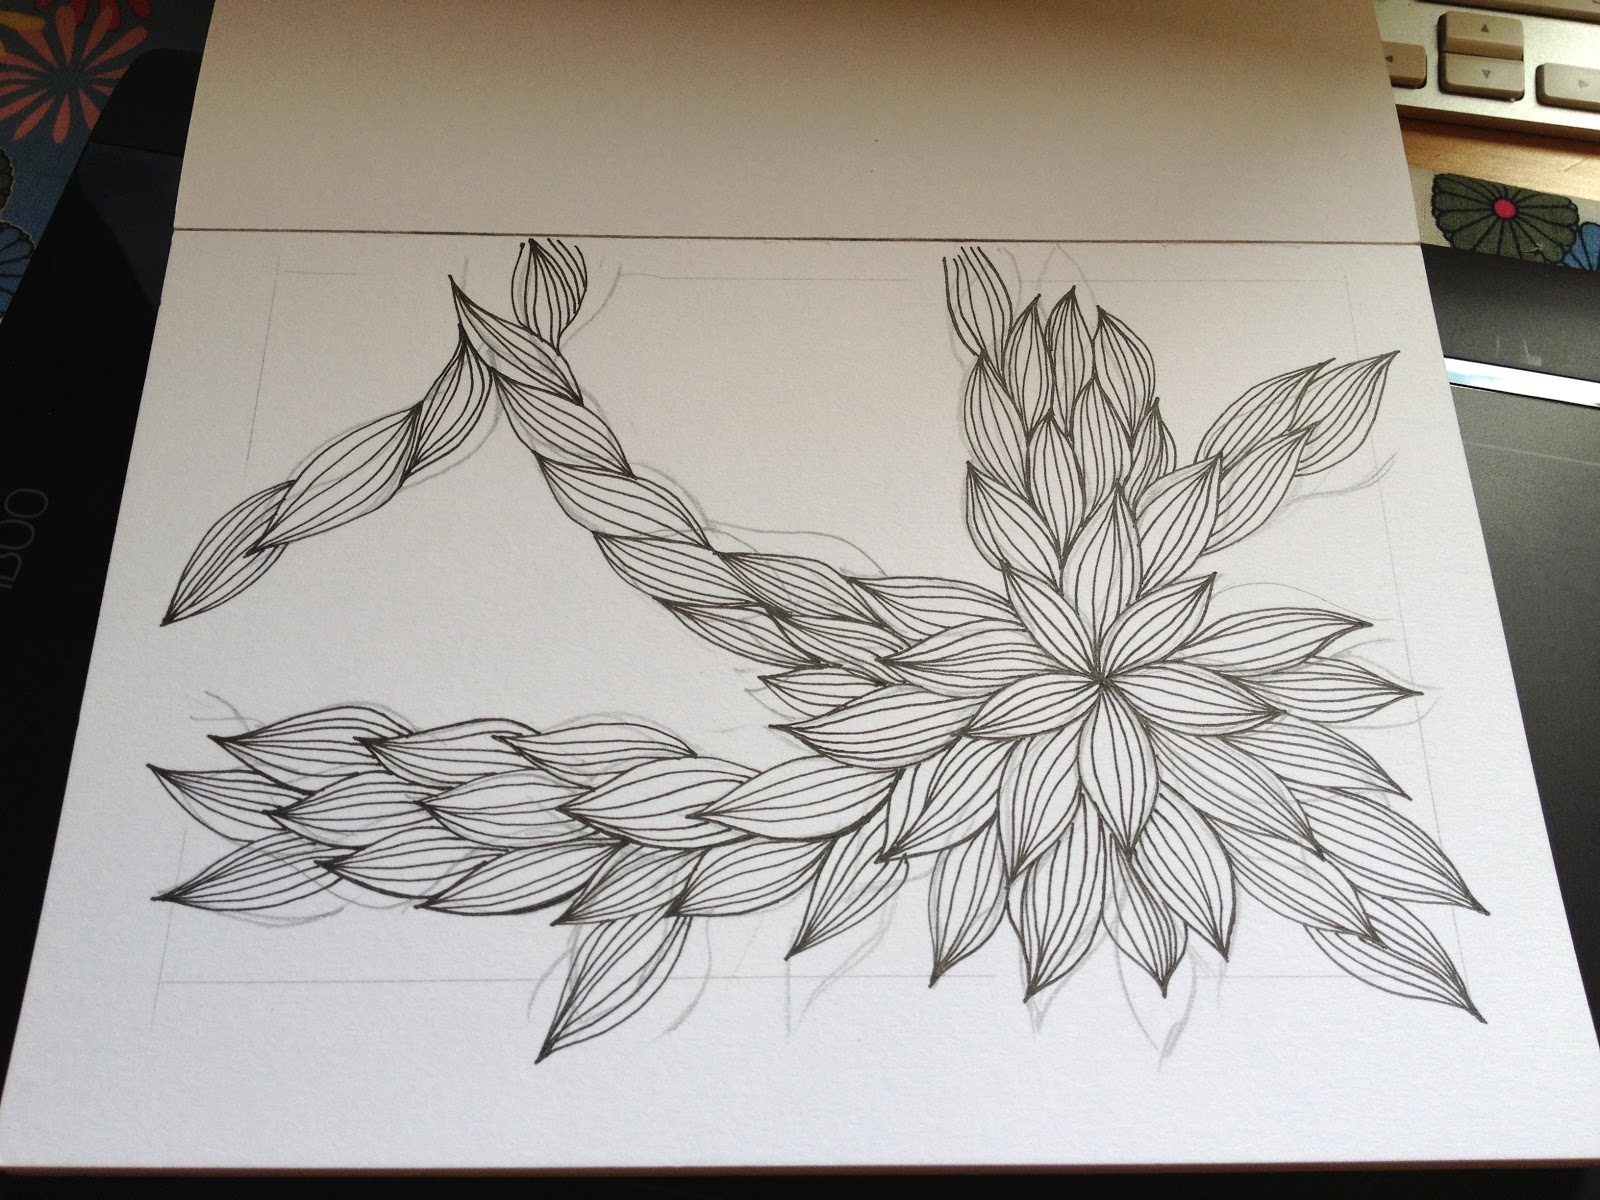 Kalo Make Art Bespoke Wedding Invitation Designs: Drawing FunEasy Cool Designs To Draw On Paper